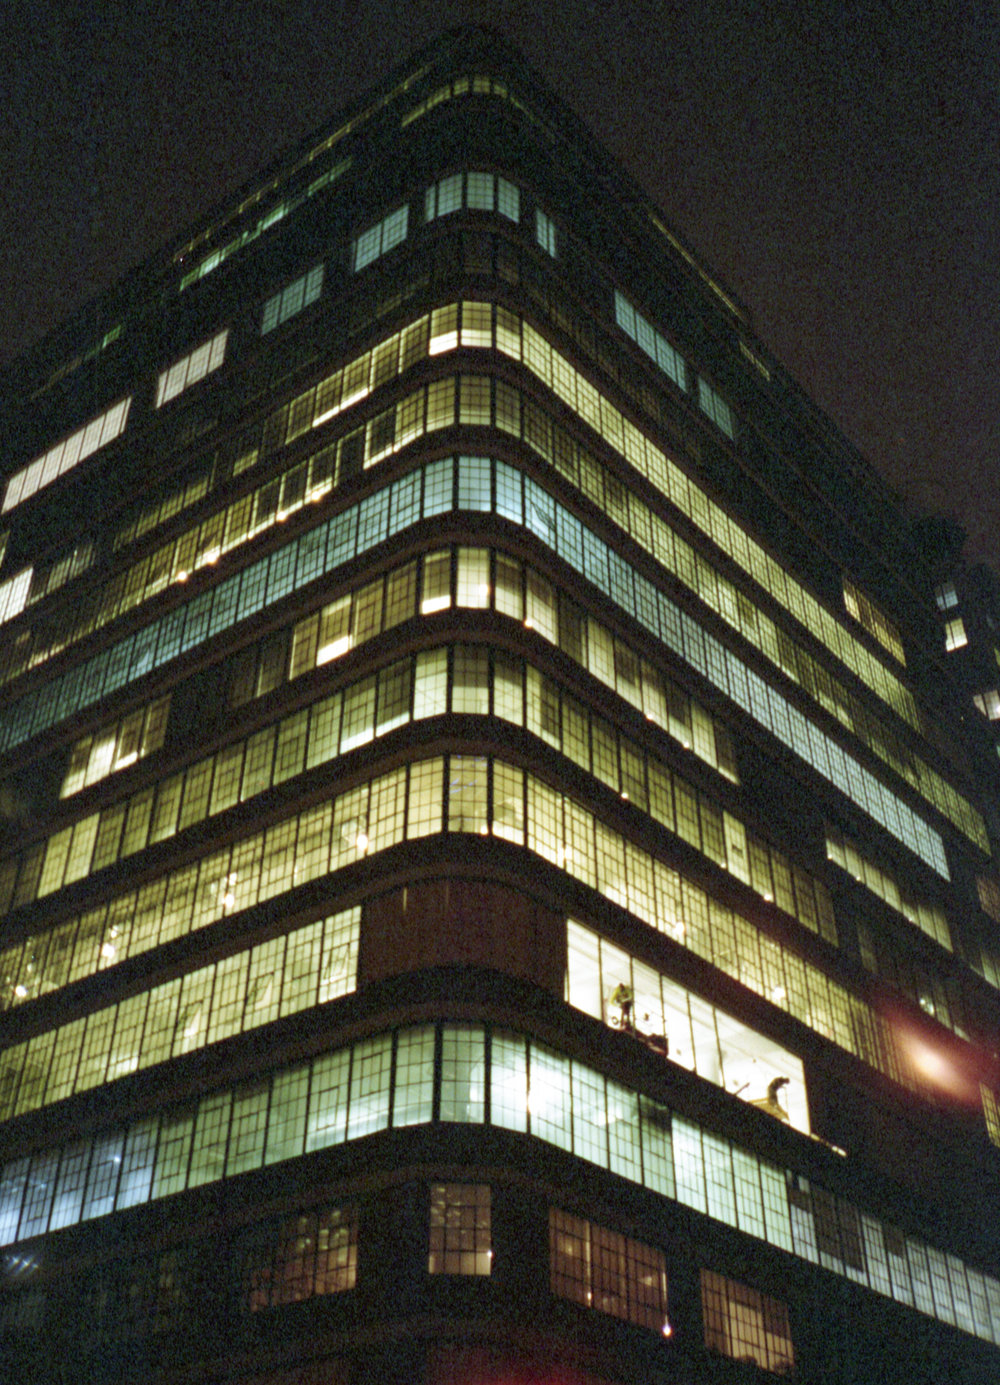 building-169.jpg